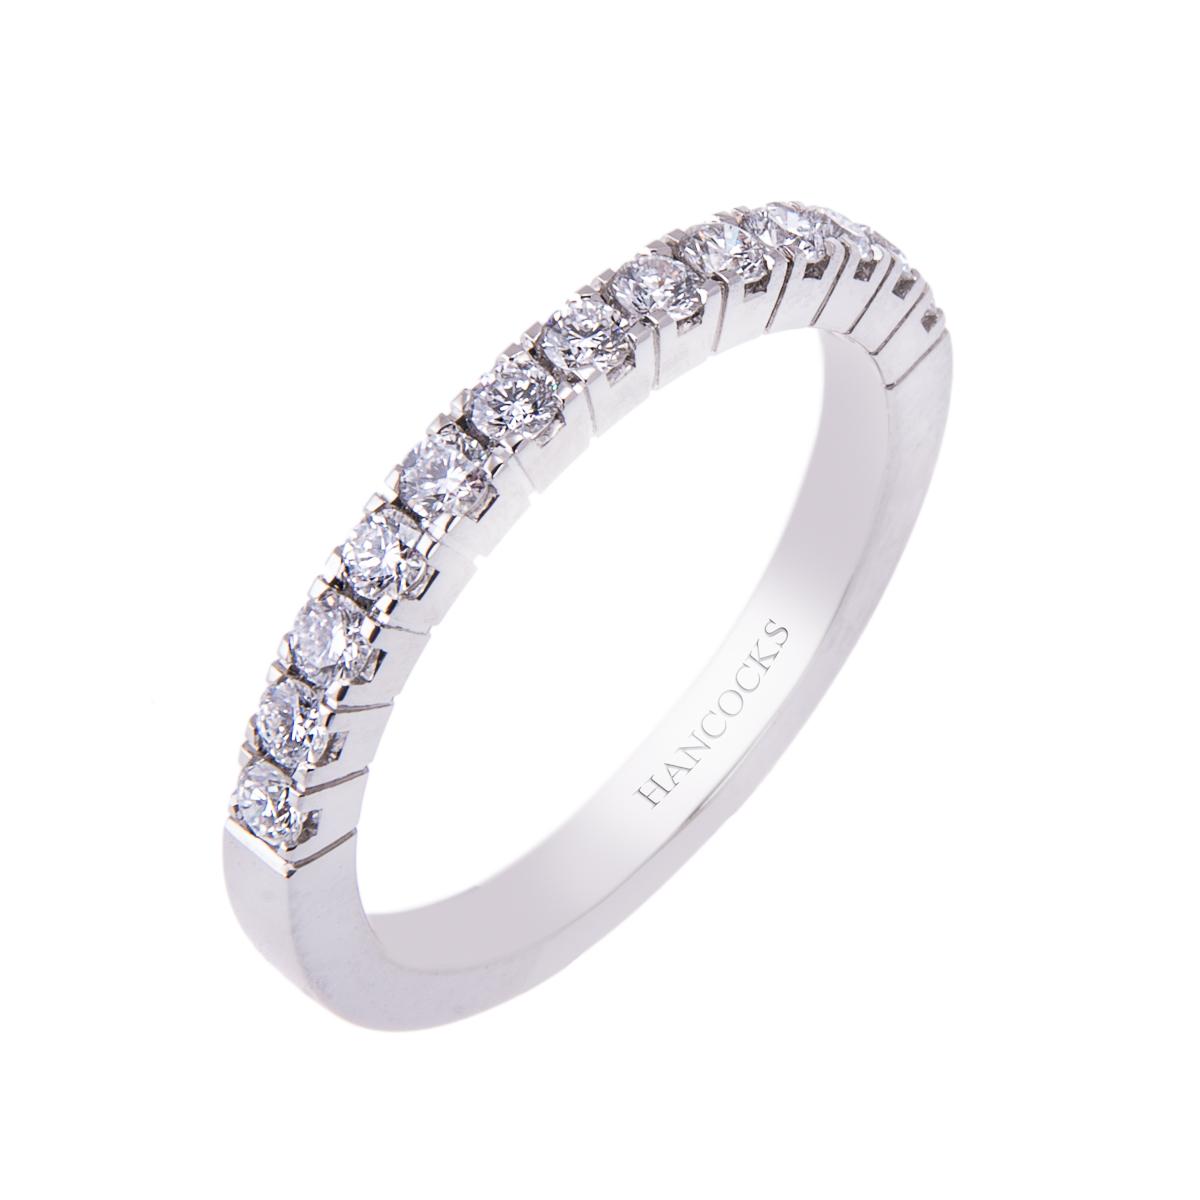 diamond-set-wedding-ring-hancocks-manchester